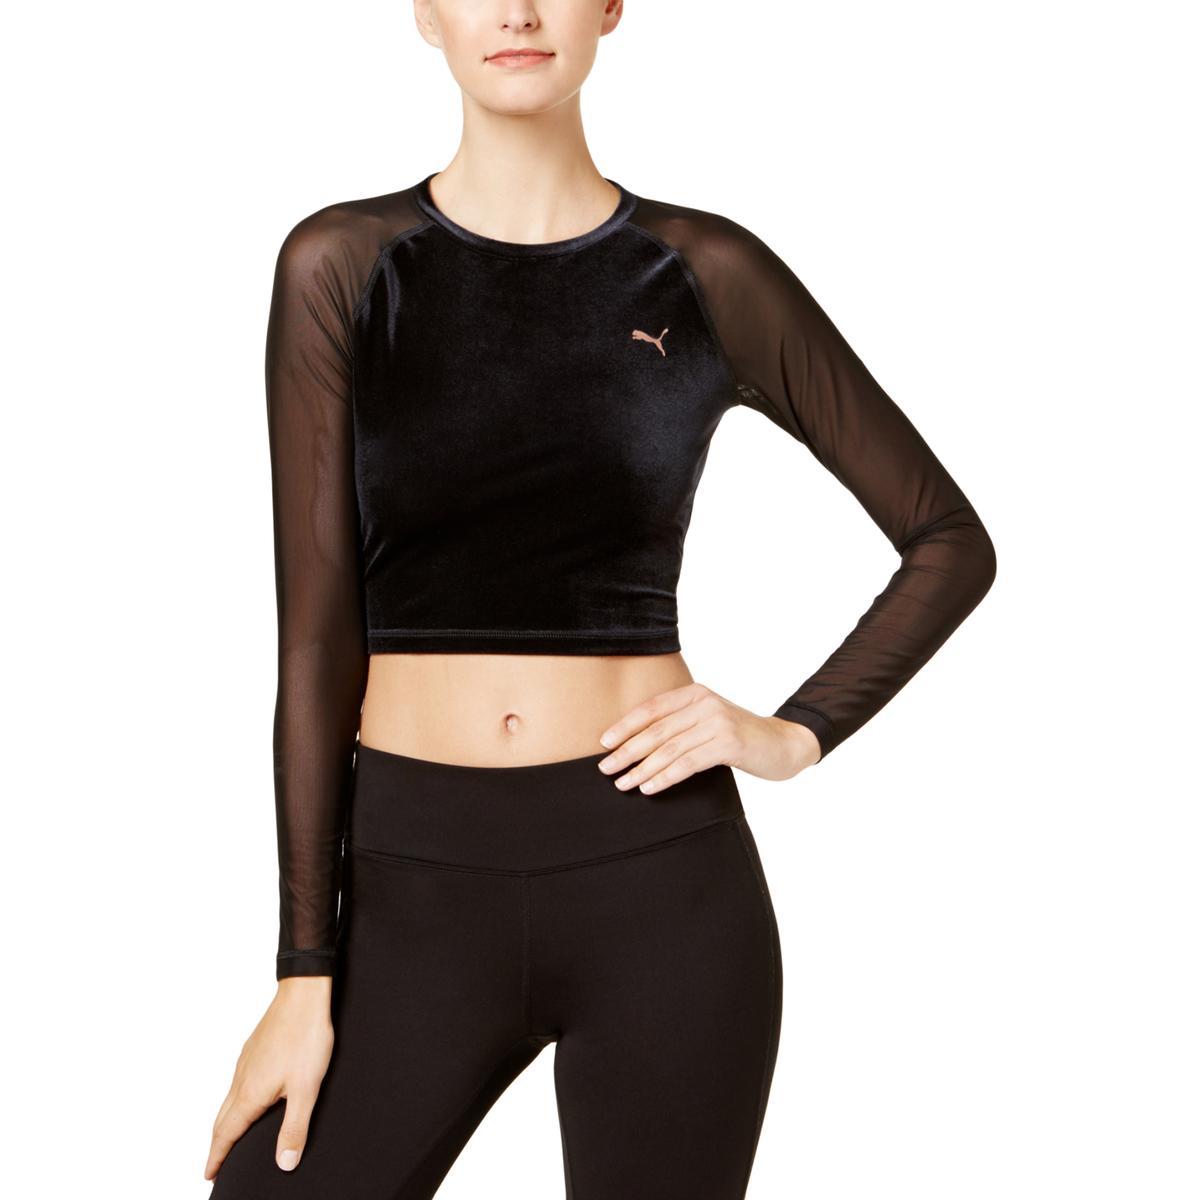 Details about Puma Womens Crop Top Velvet Mesh Sleeve Shirts   Tops BHFO  5511 a568909fb60